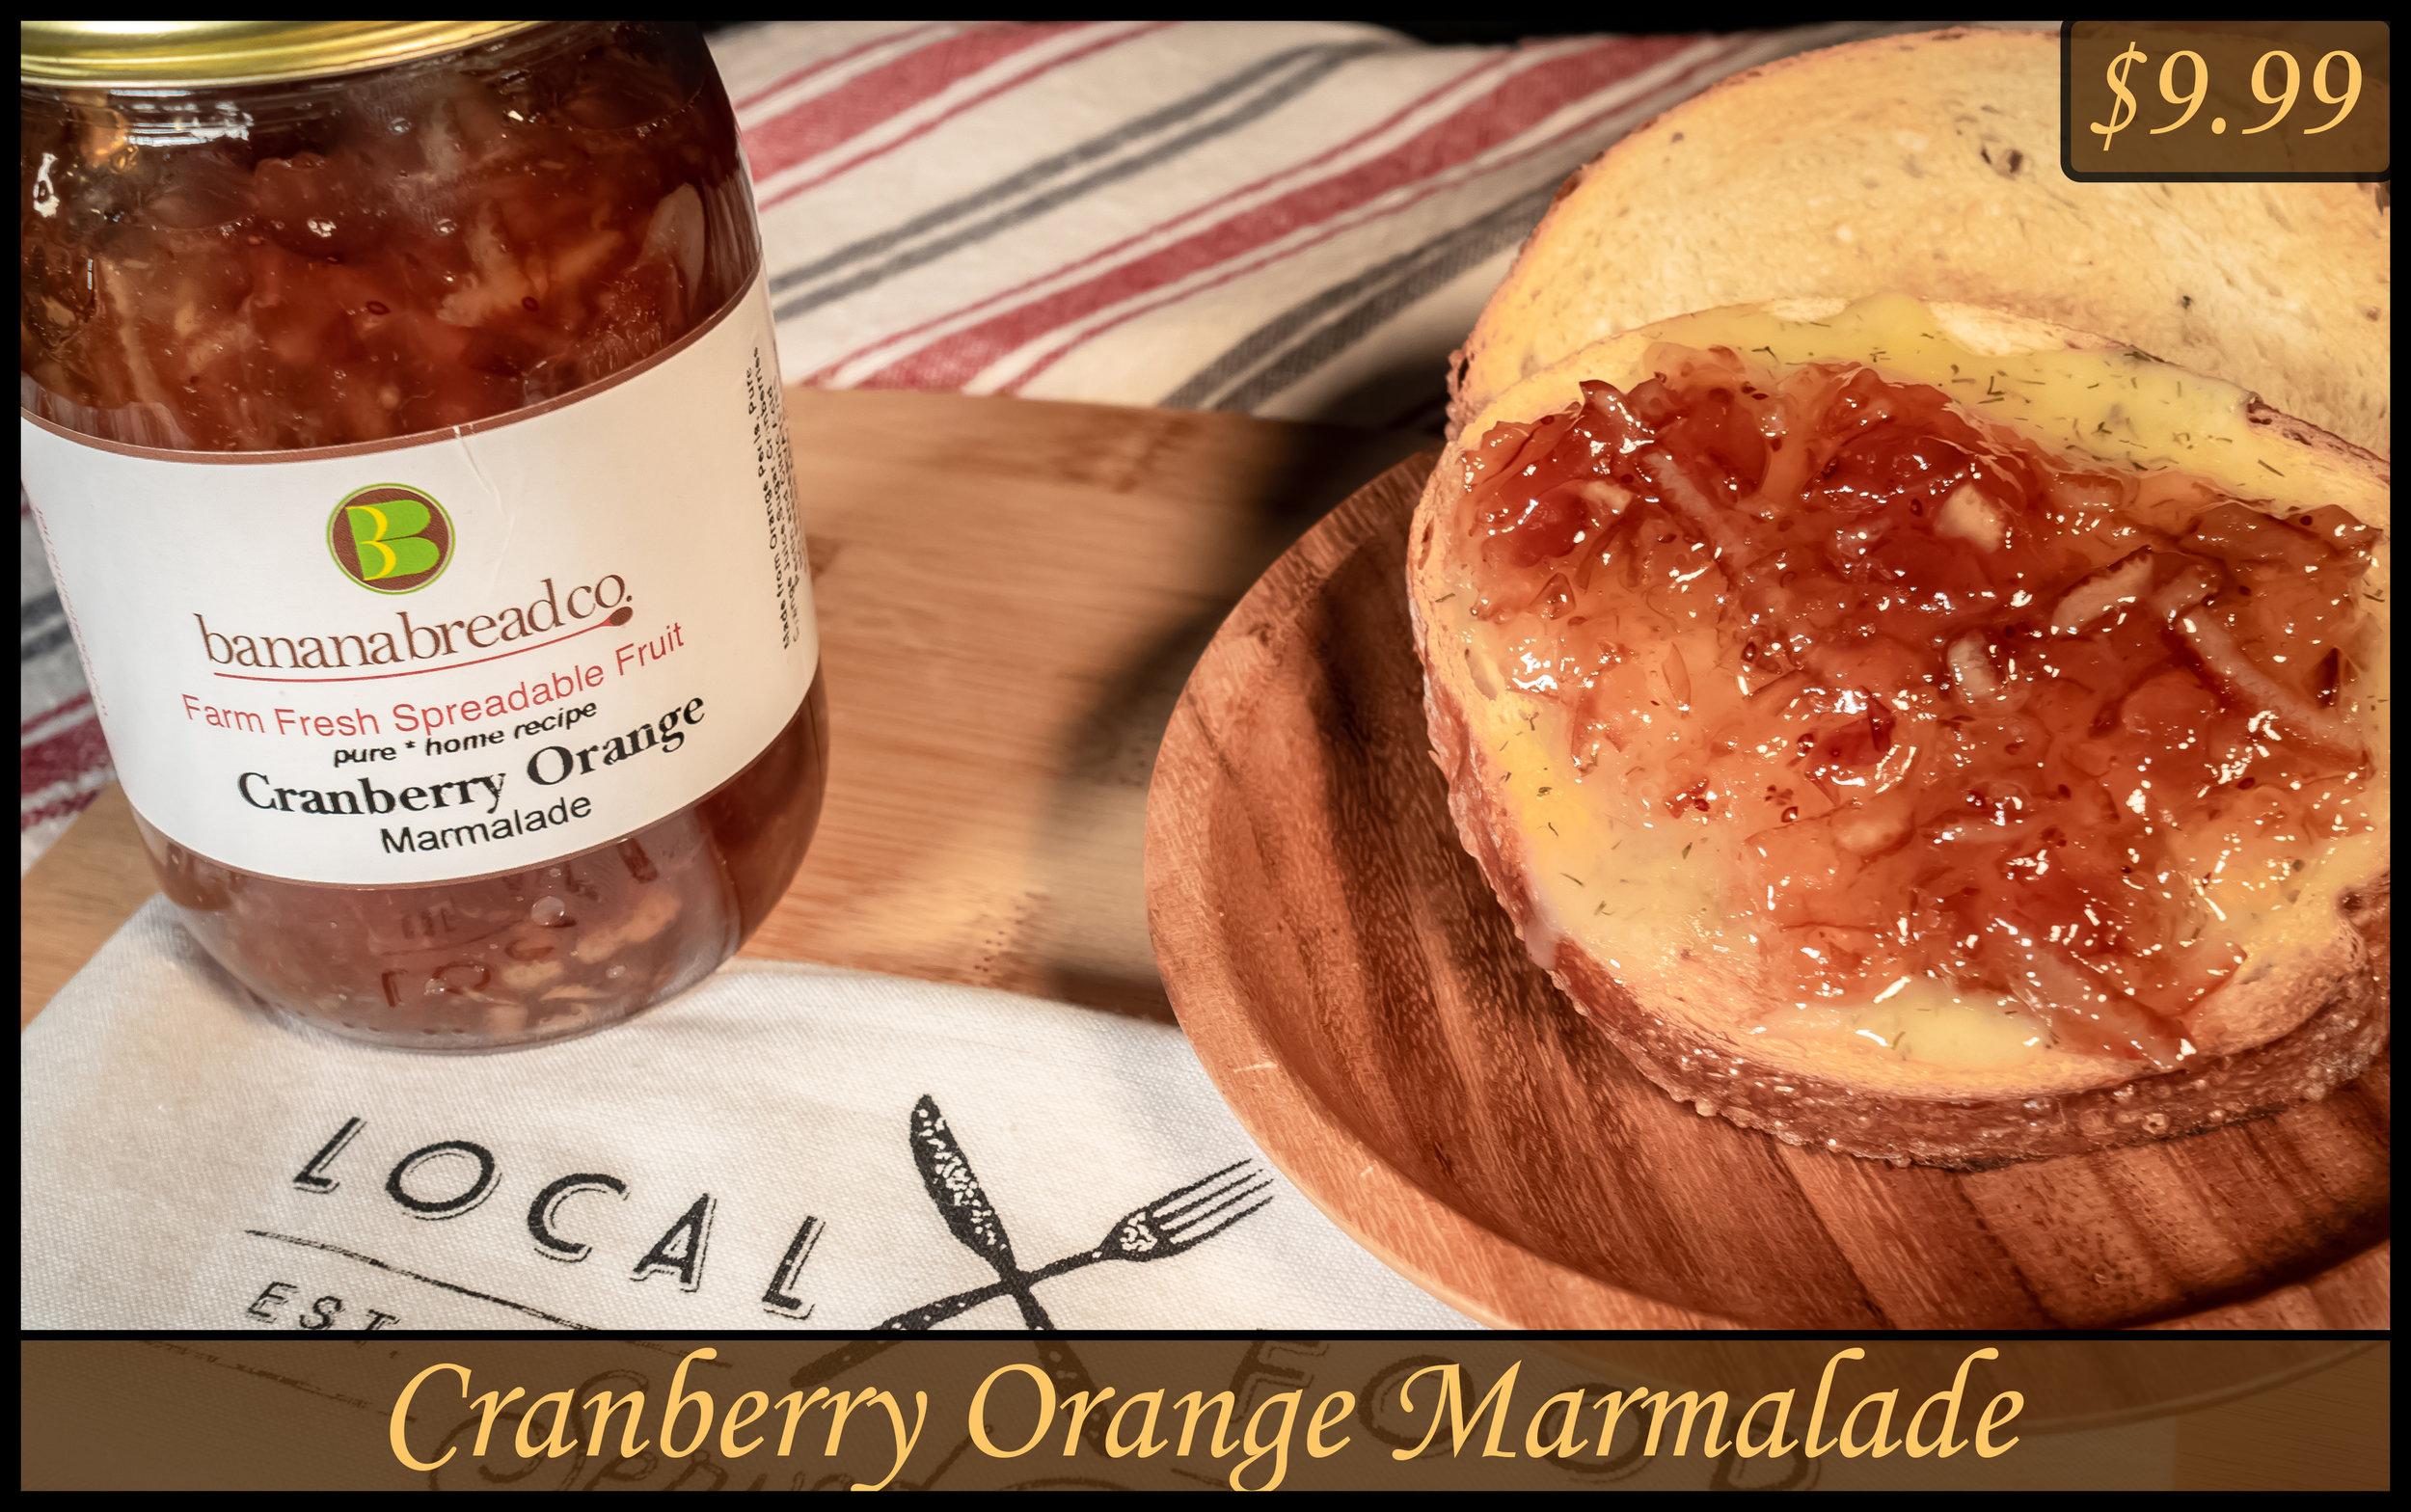 Cranberry Orange Marmalade.jpg